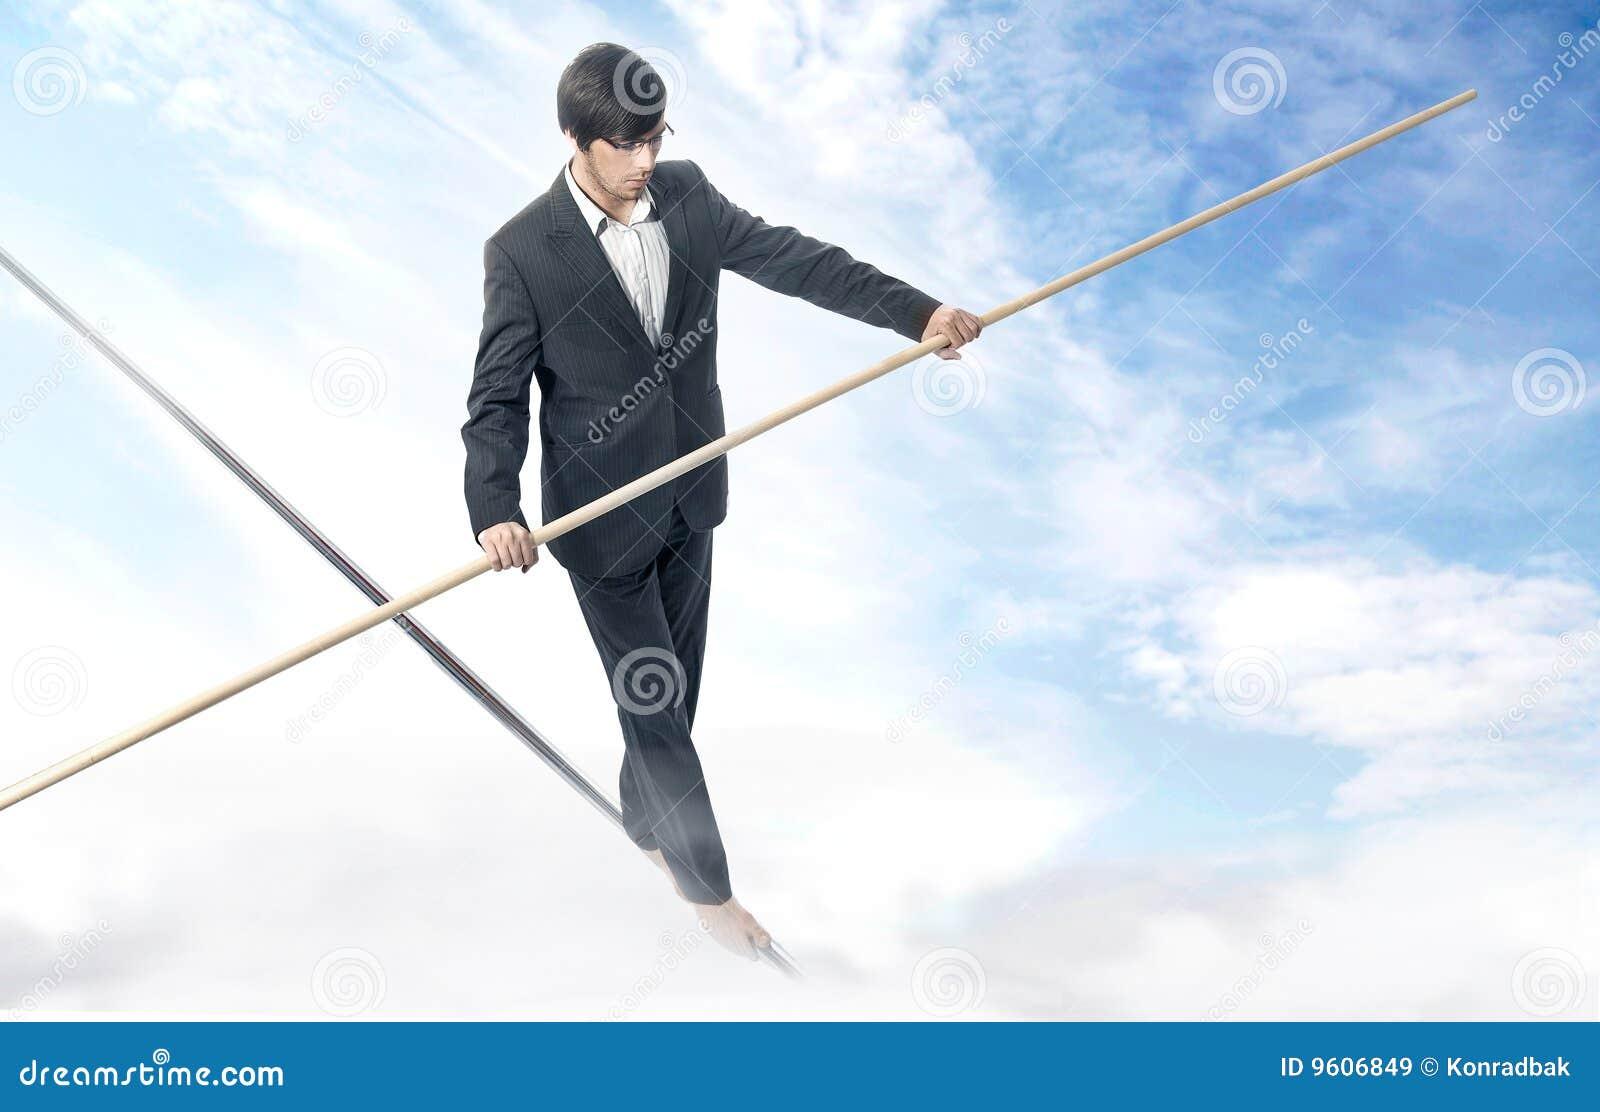 Marchant une corde raide